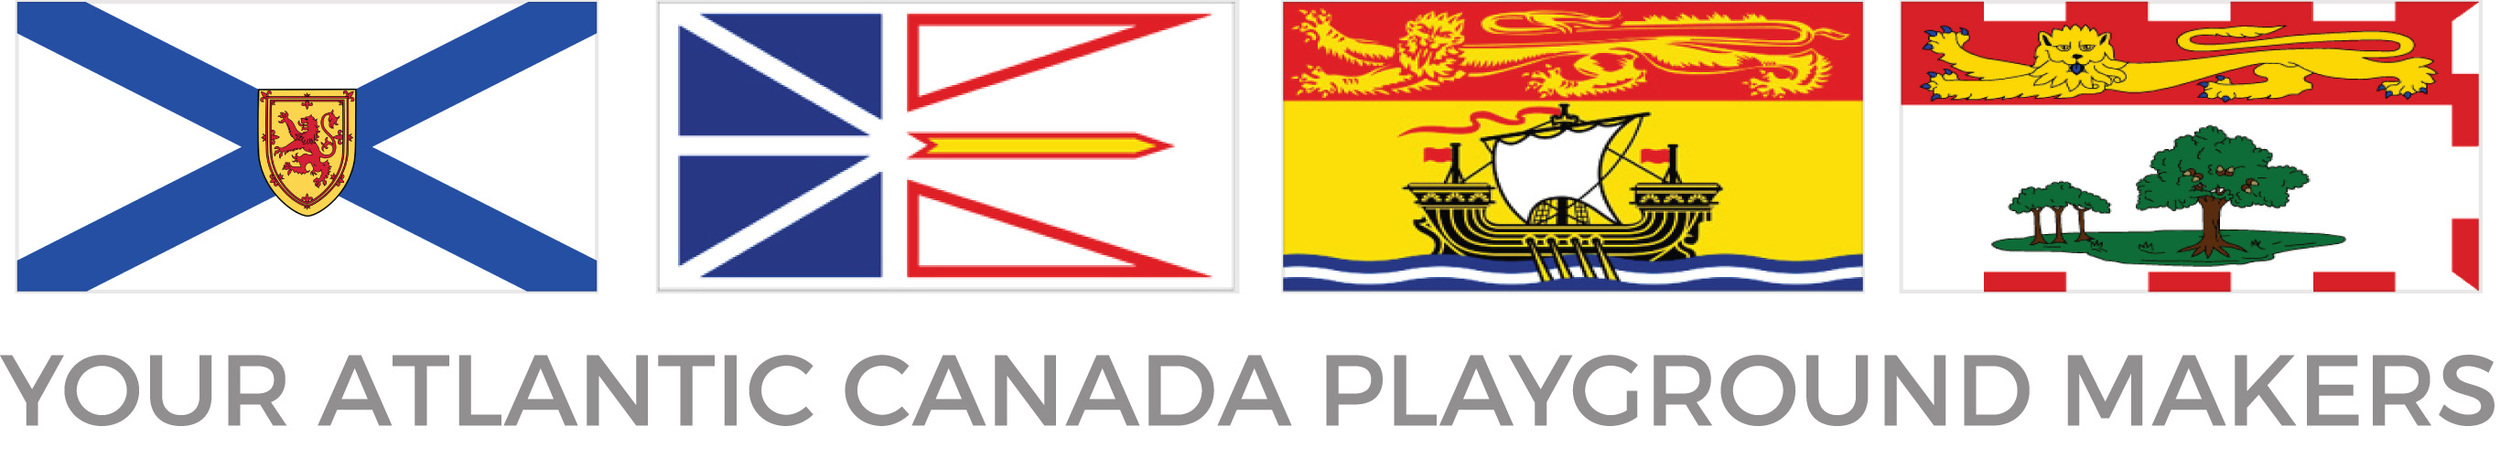 Atlantic Canada Playgorund Manufacturers